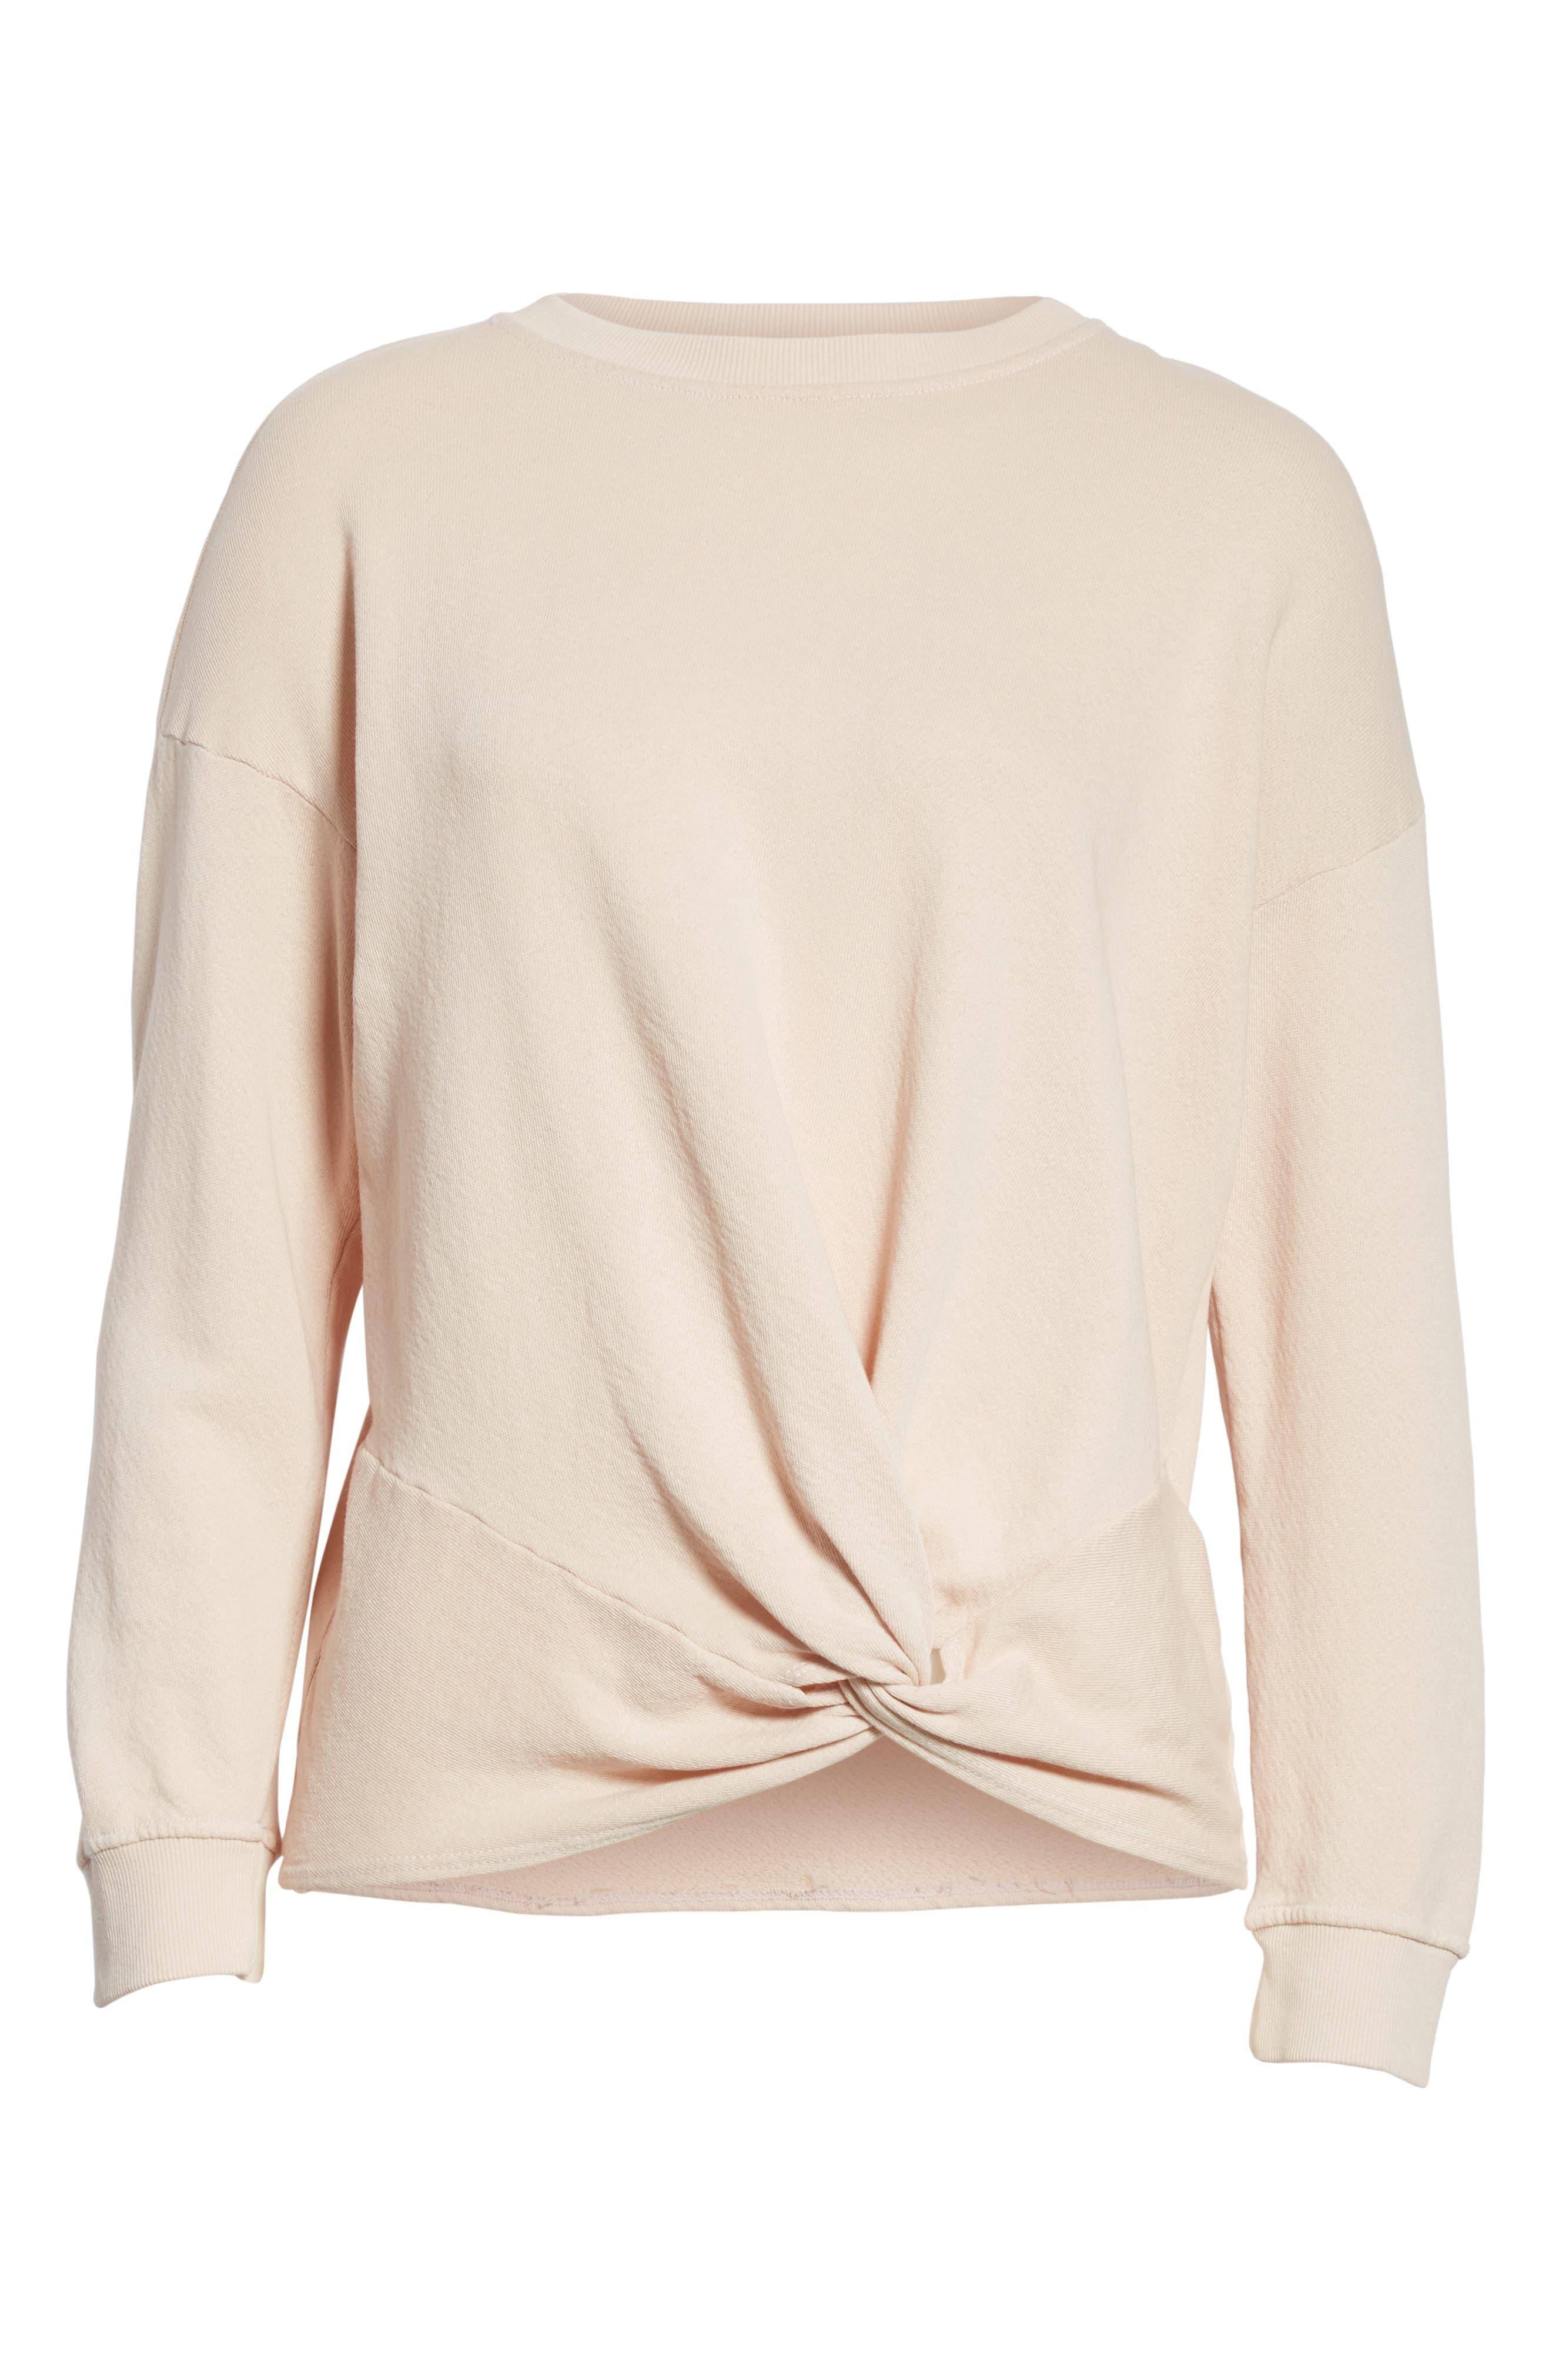 Nazani Twist Front Sweatshirt,                             Alternate thumbnail 6, color,                             Heather Rose